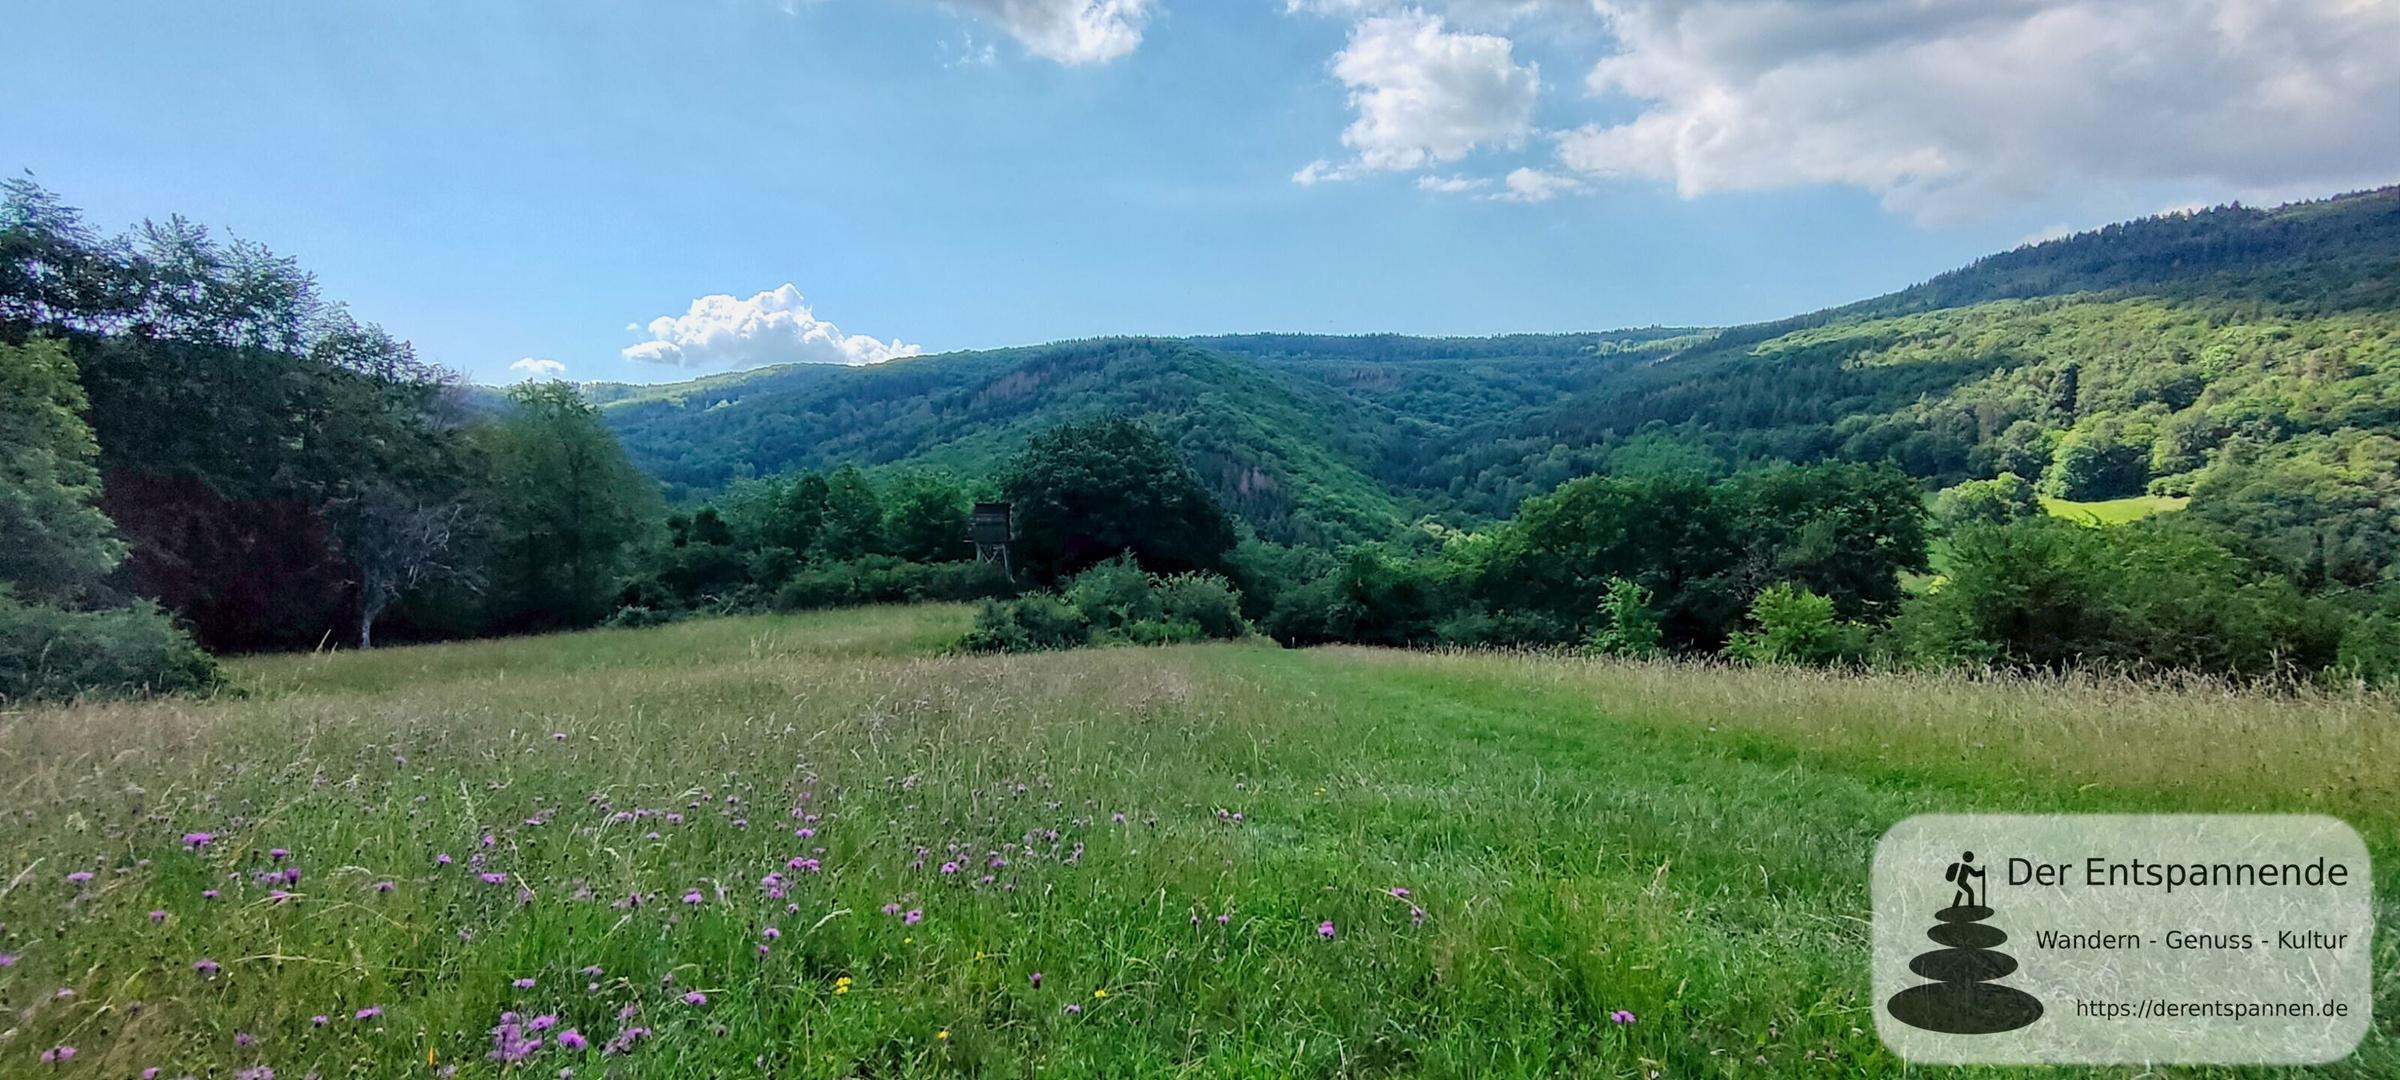 Wisper Trails: Via Monte Preso wandern